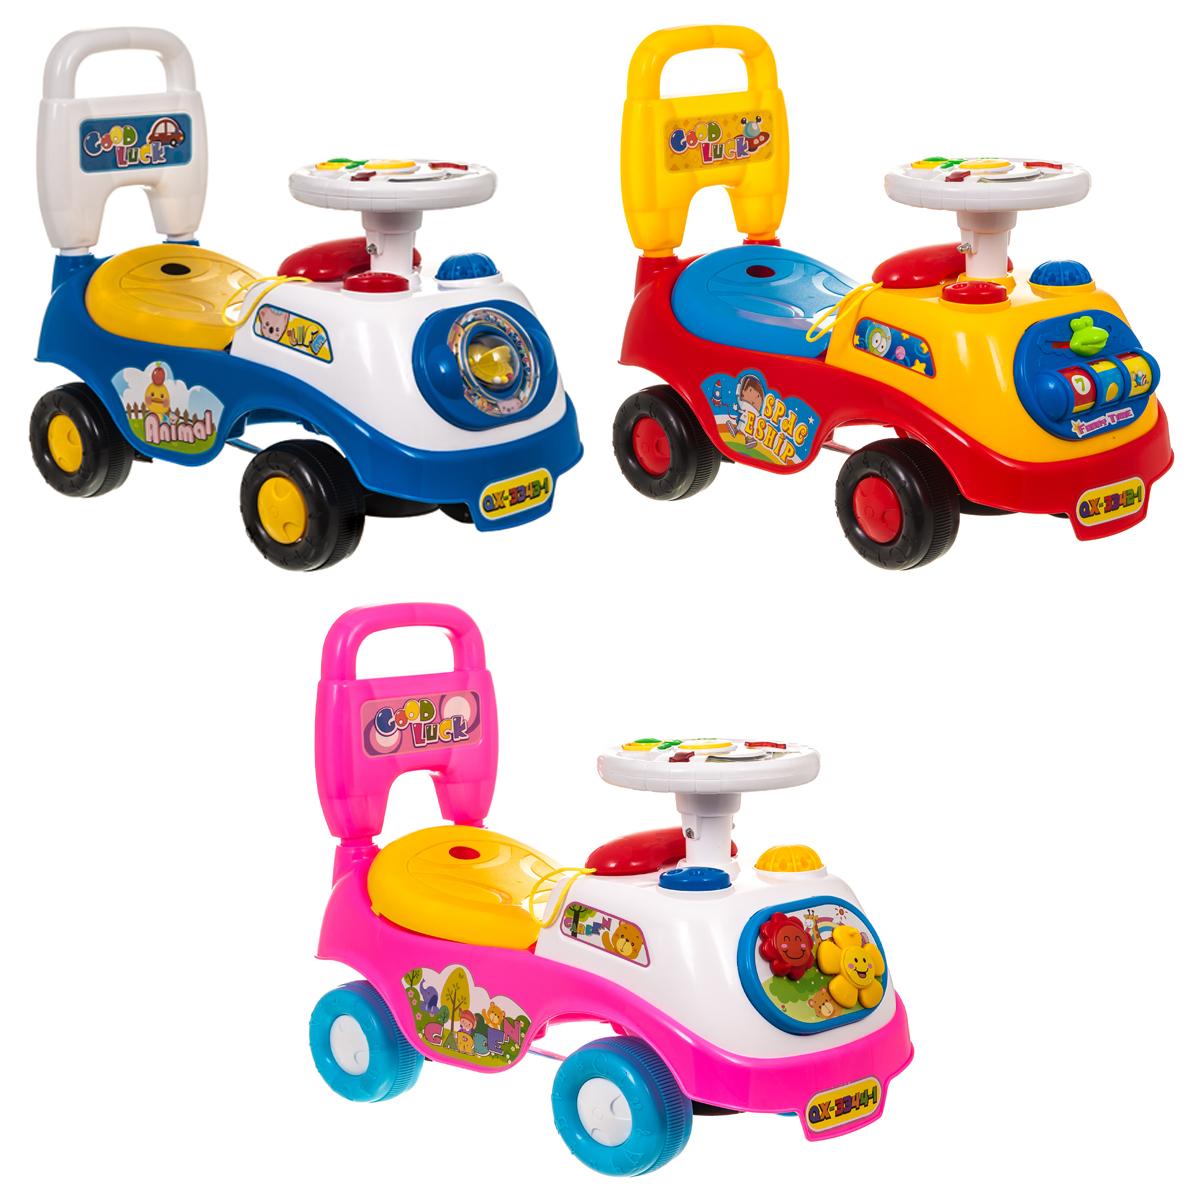 Ride-on Baby Walker Children for Early Development Bear Car Kids Xmas Toy